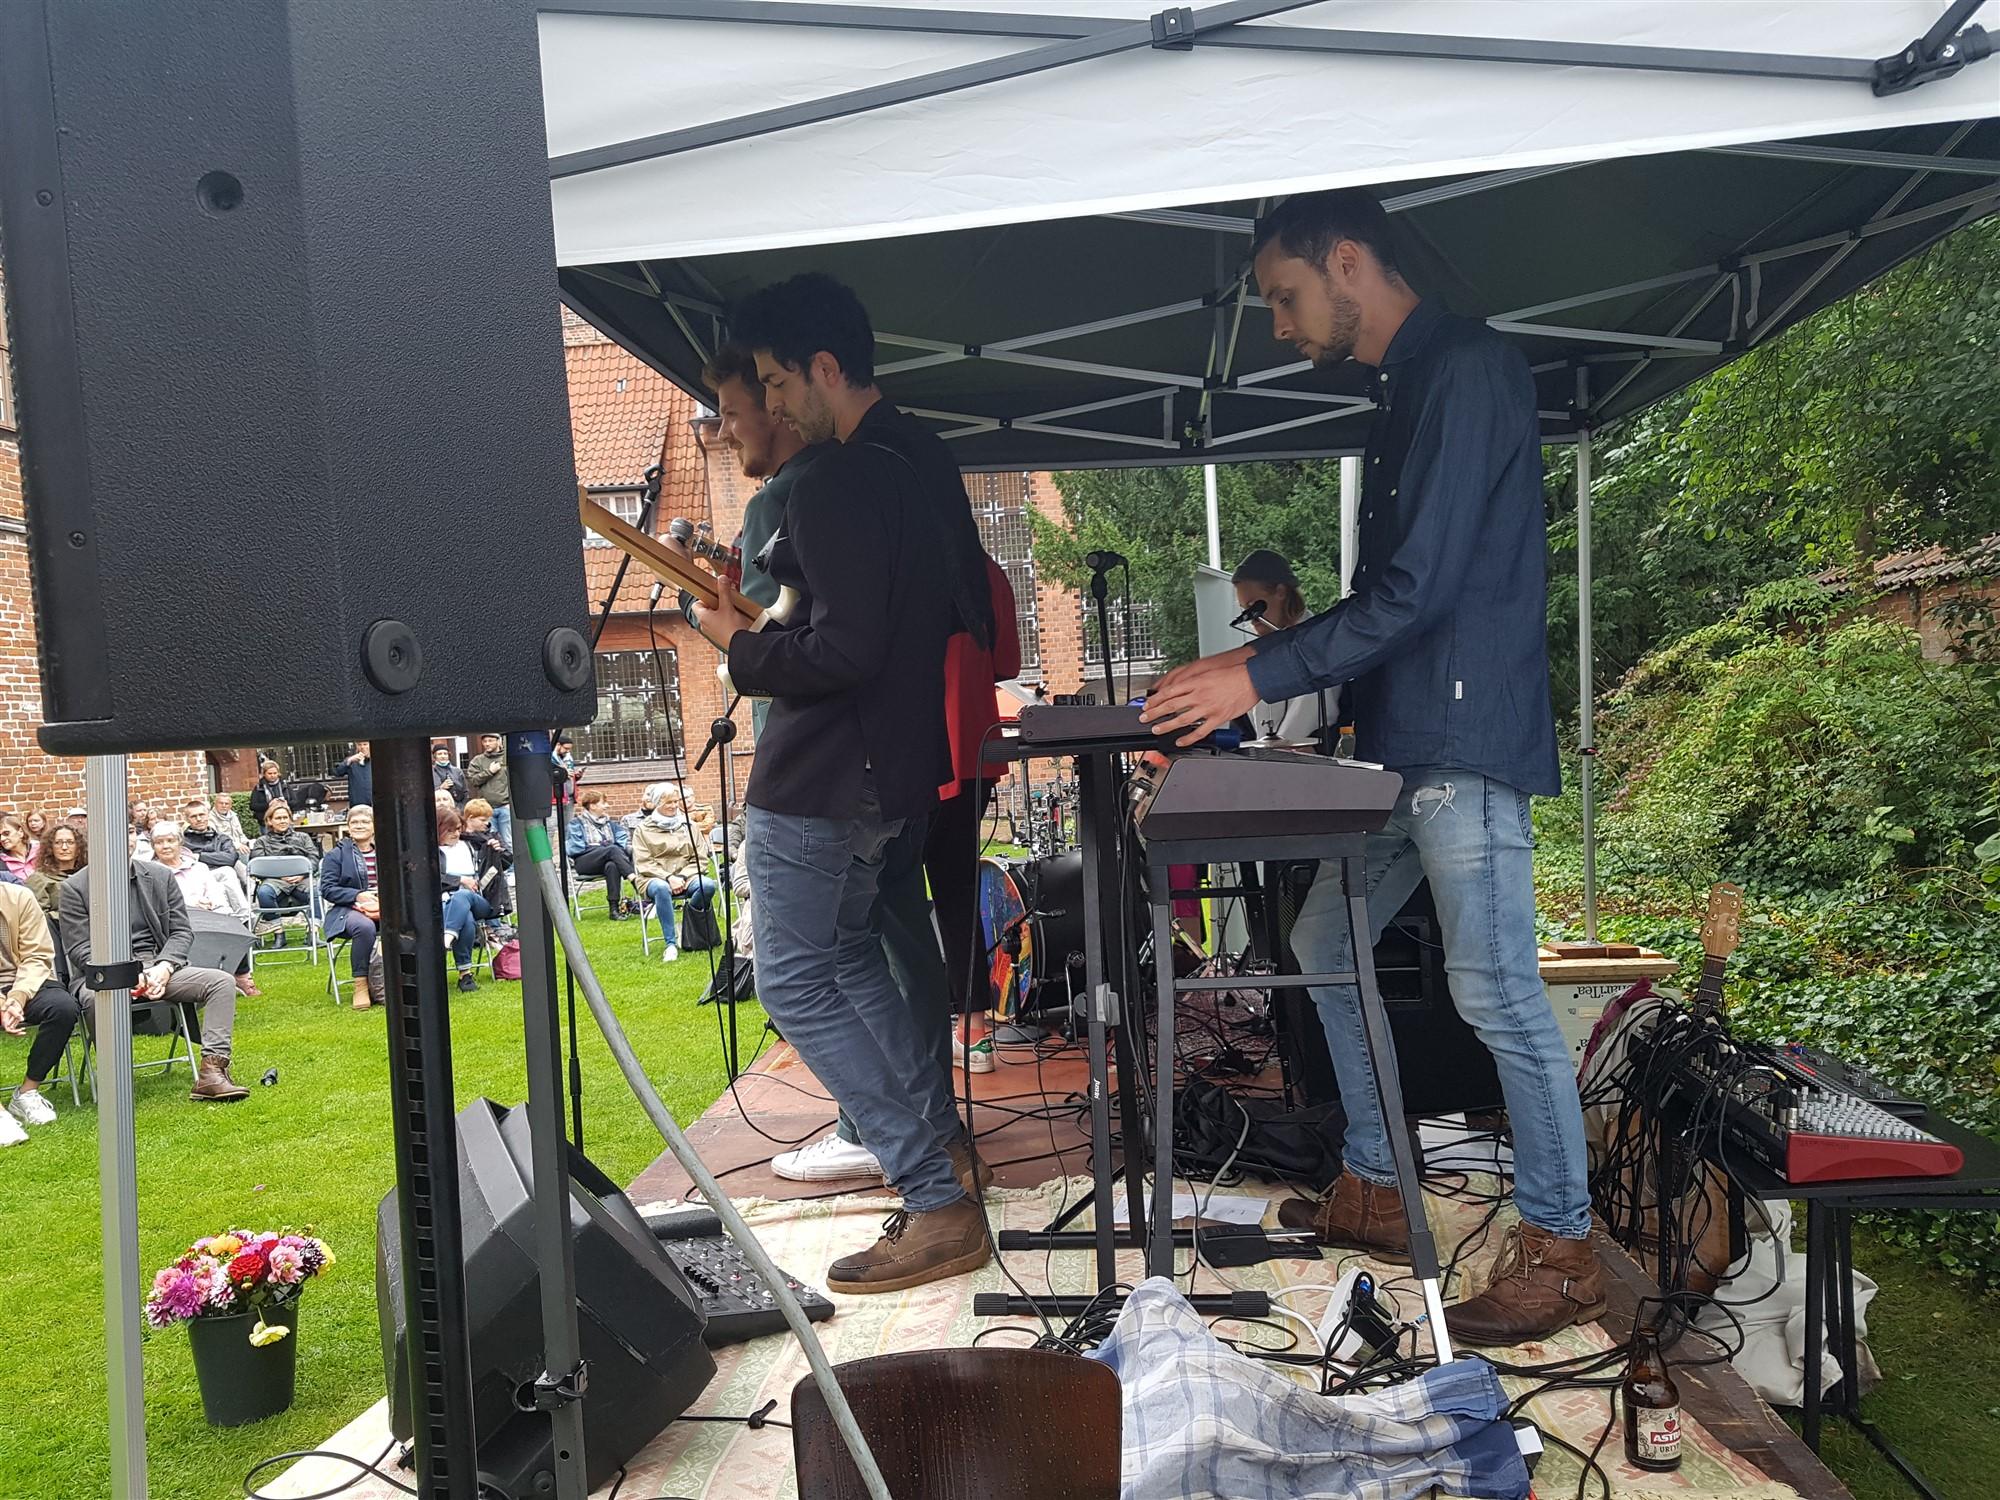 2021-08-28_Rathausgarten-Sommerfestival (17)